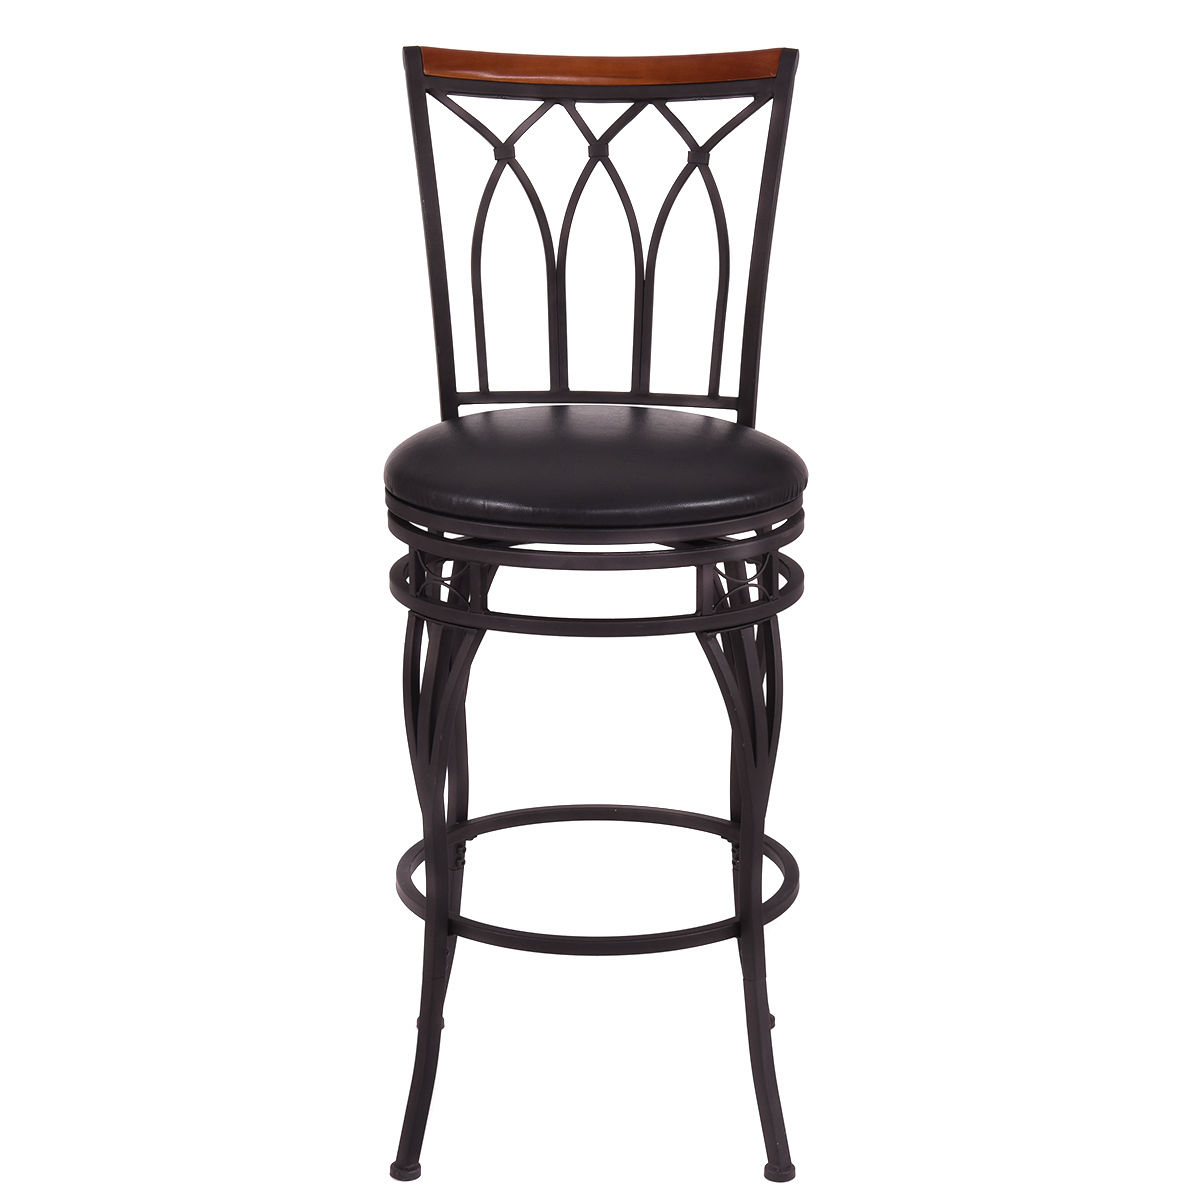 "Giantex Vintage Swivel Bar Stool 24"" 28"" Height Adjustable Padded Seat Bistro Pub Chair HW54180"